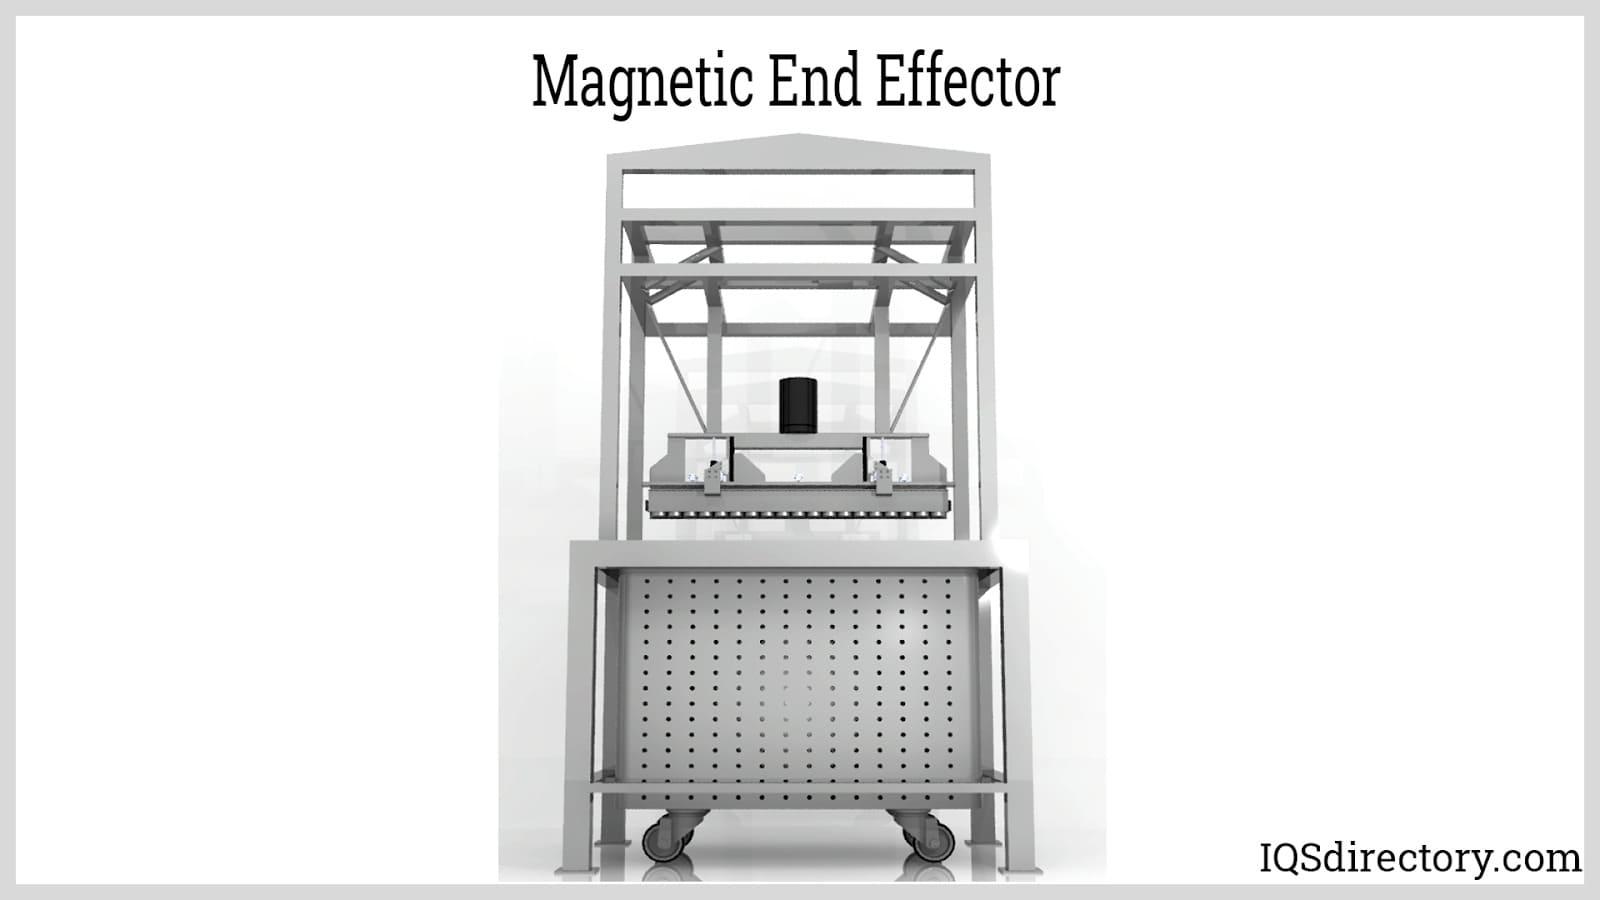 Magnetic End Effector